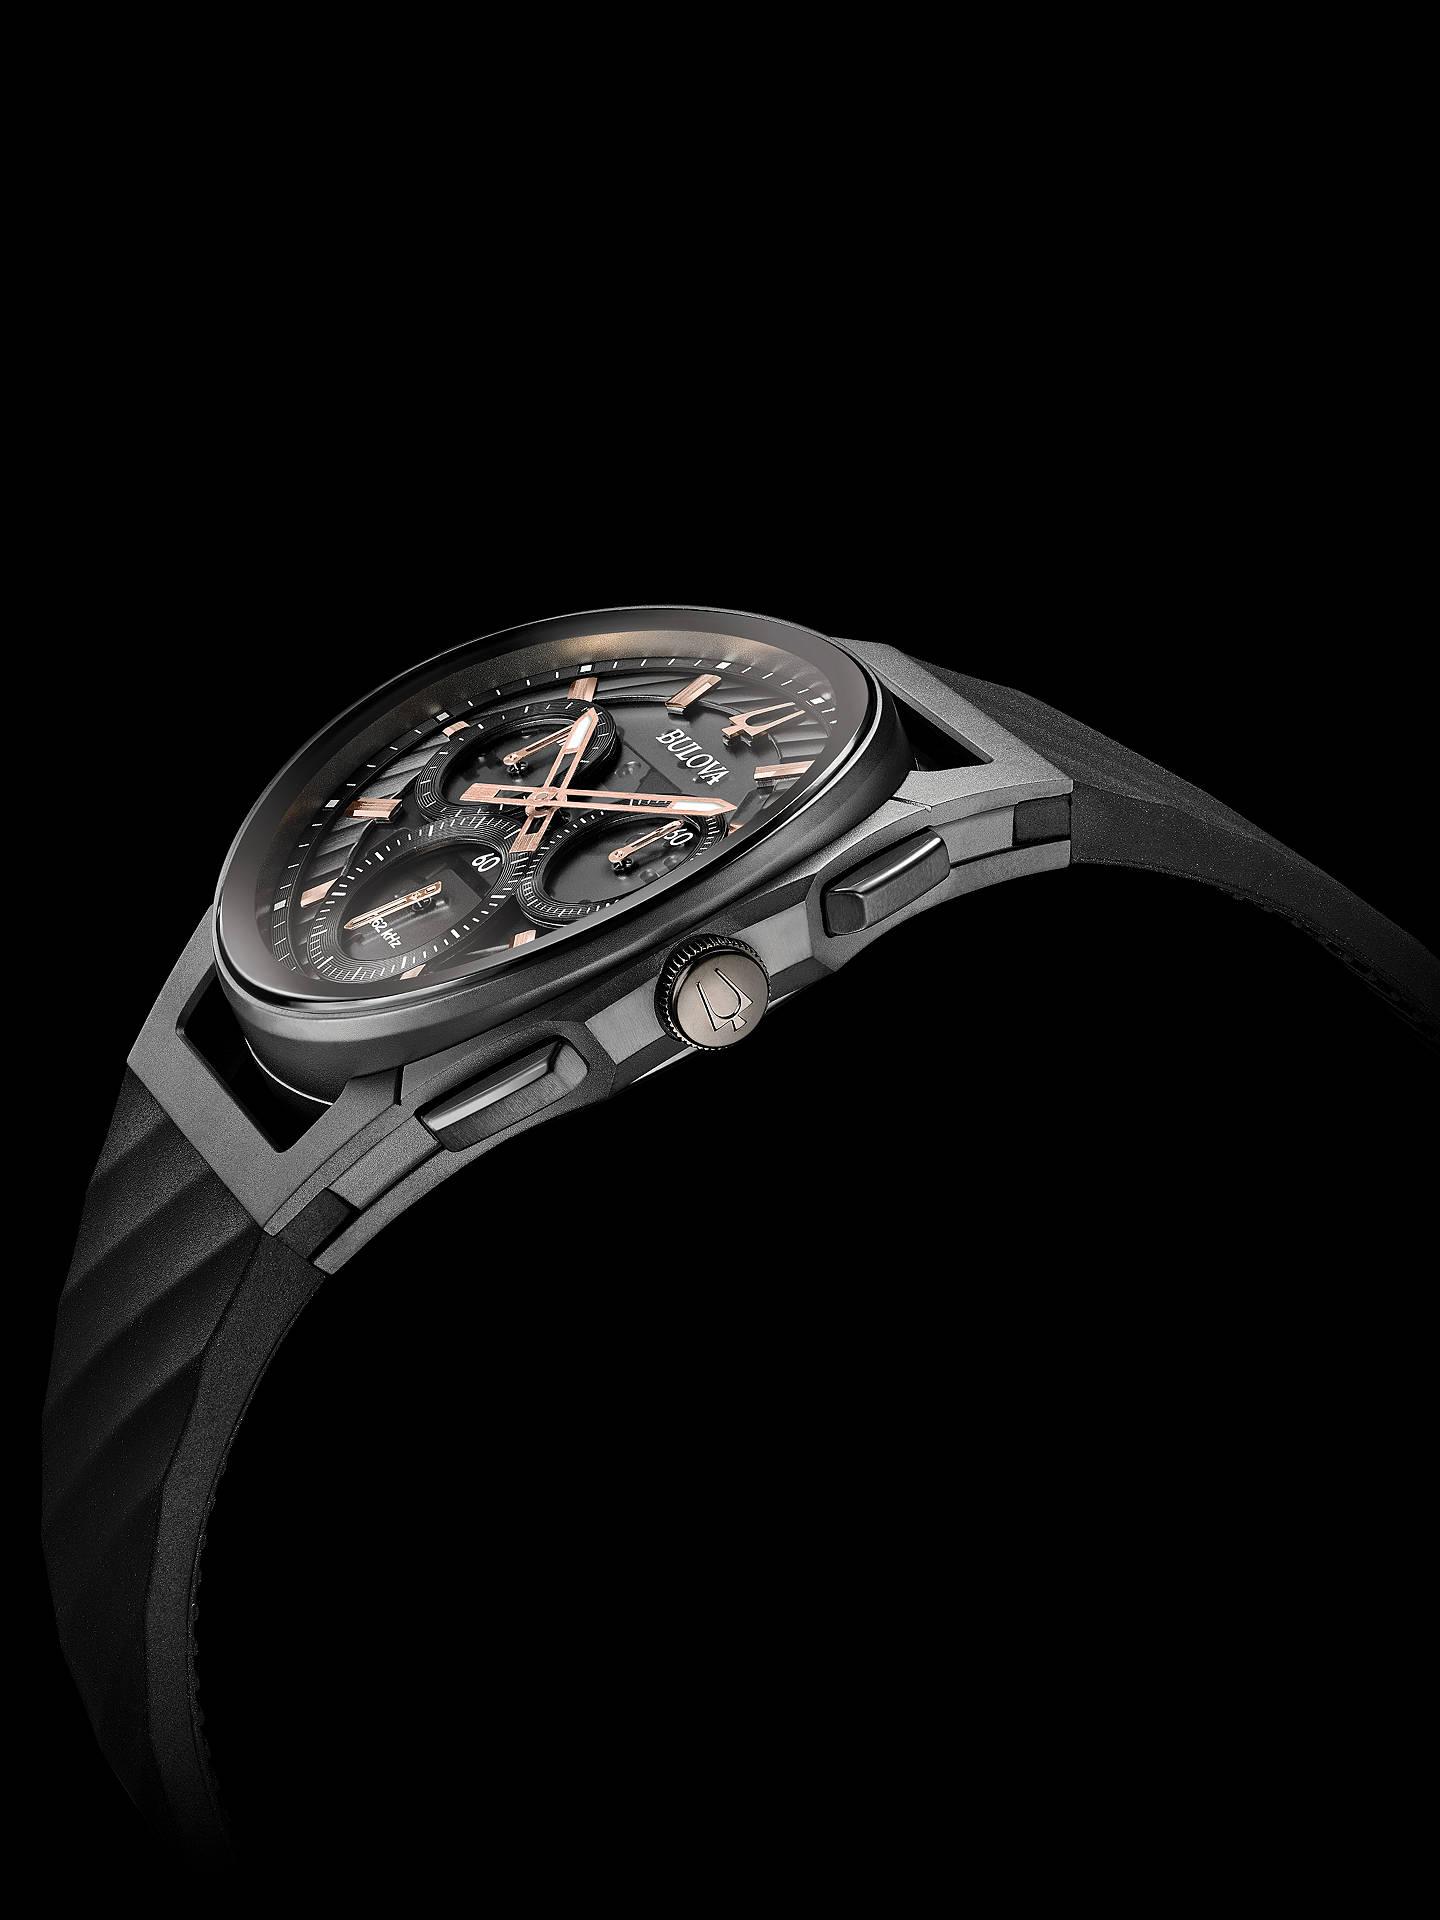 373b5d3d2 ... Buy Bulova Men's Curv Chronograph Rubber Strap Watch, Black/Grey 98A162  Online at johnlewis ...